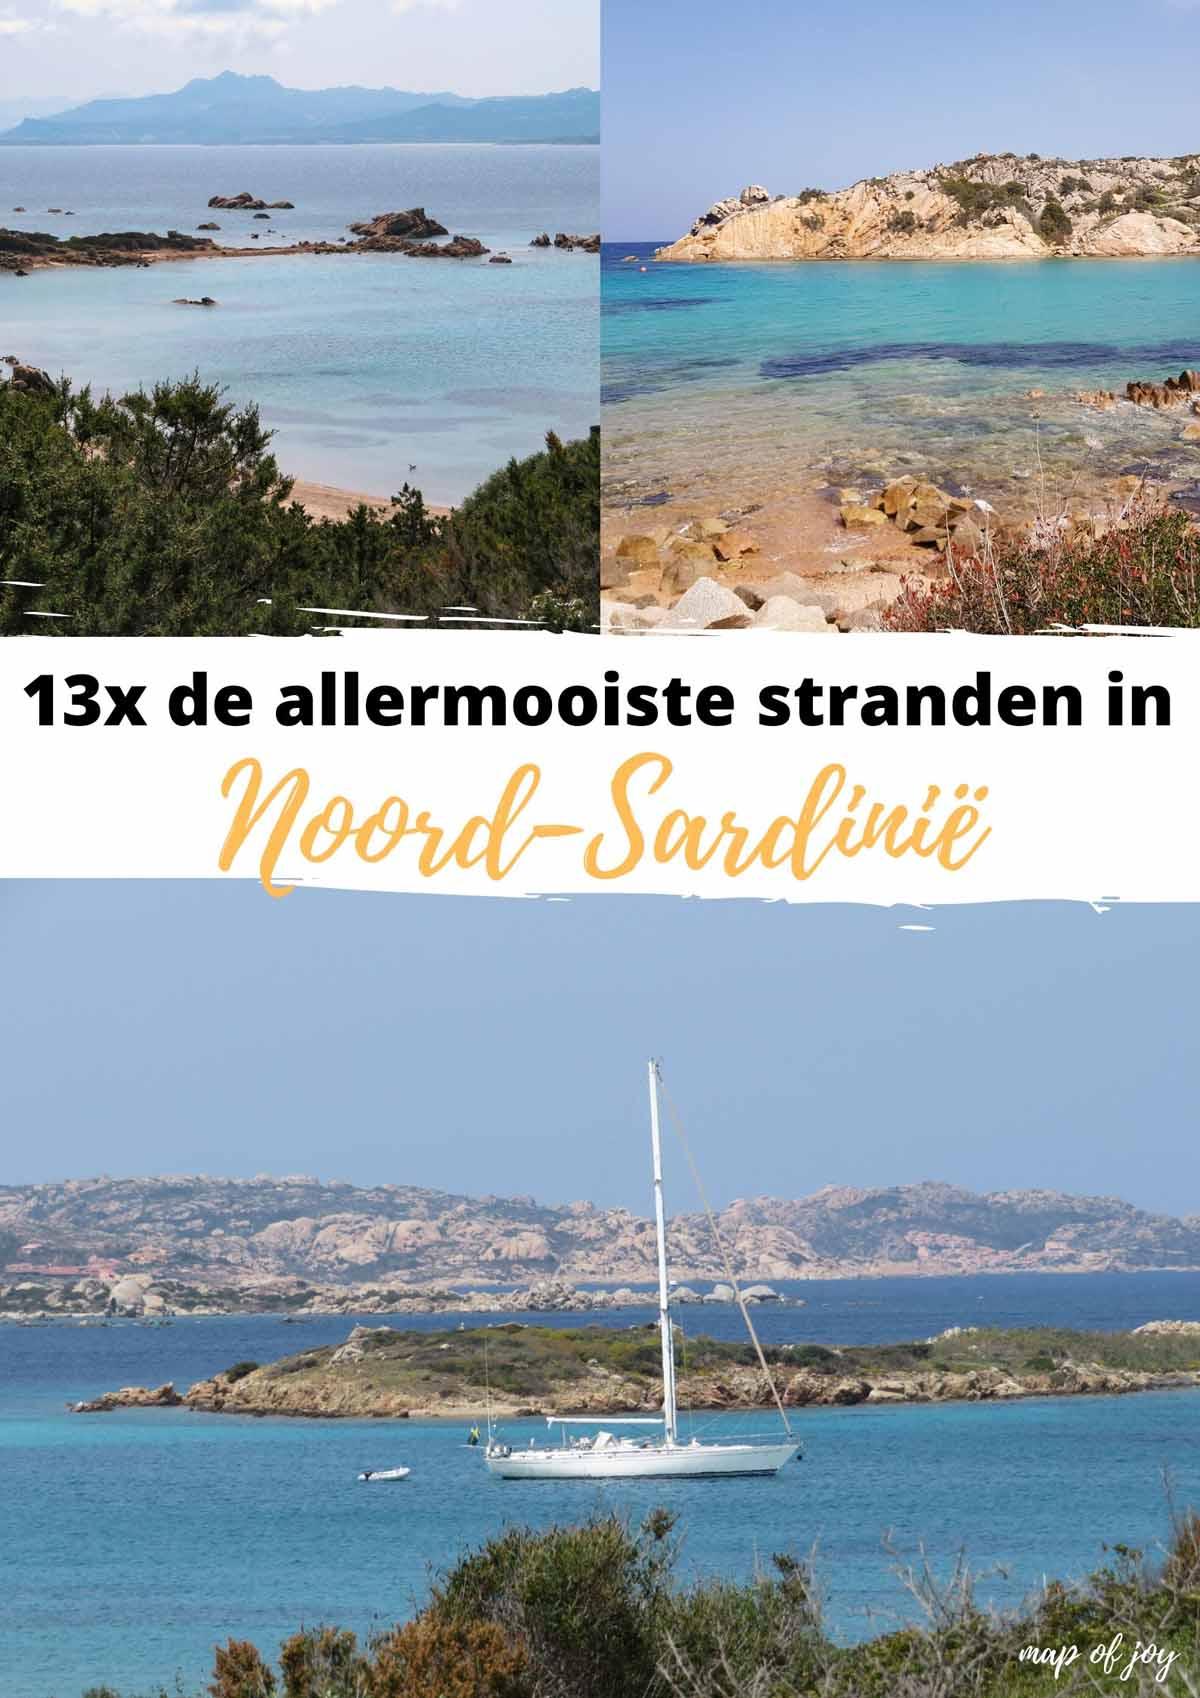 13x de allermooiste stranden in Noord-Sardinië - Map of Joy